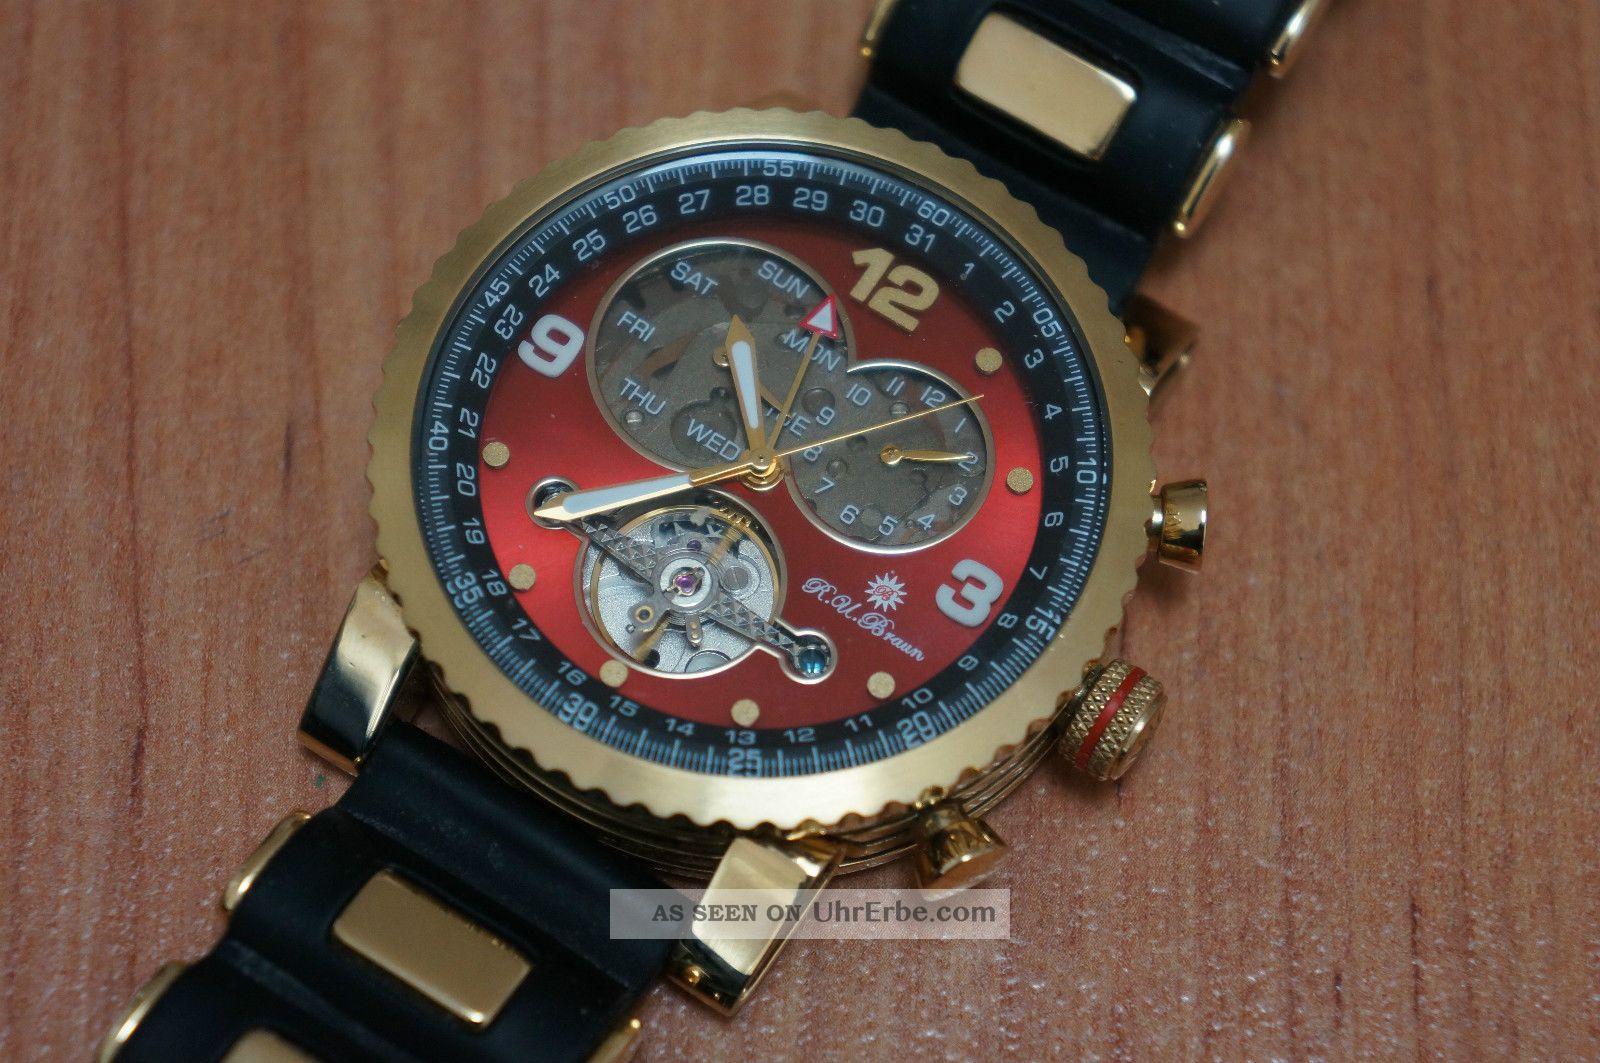 Raoul U.  Braun Rub 05 - 0051 Automatikuhr,  Edel, Armbanduhren Bild